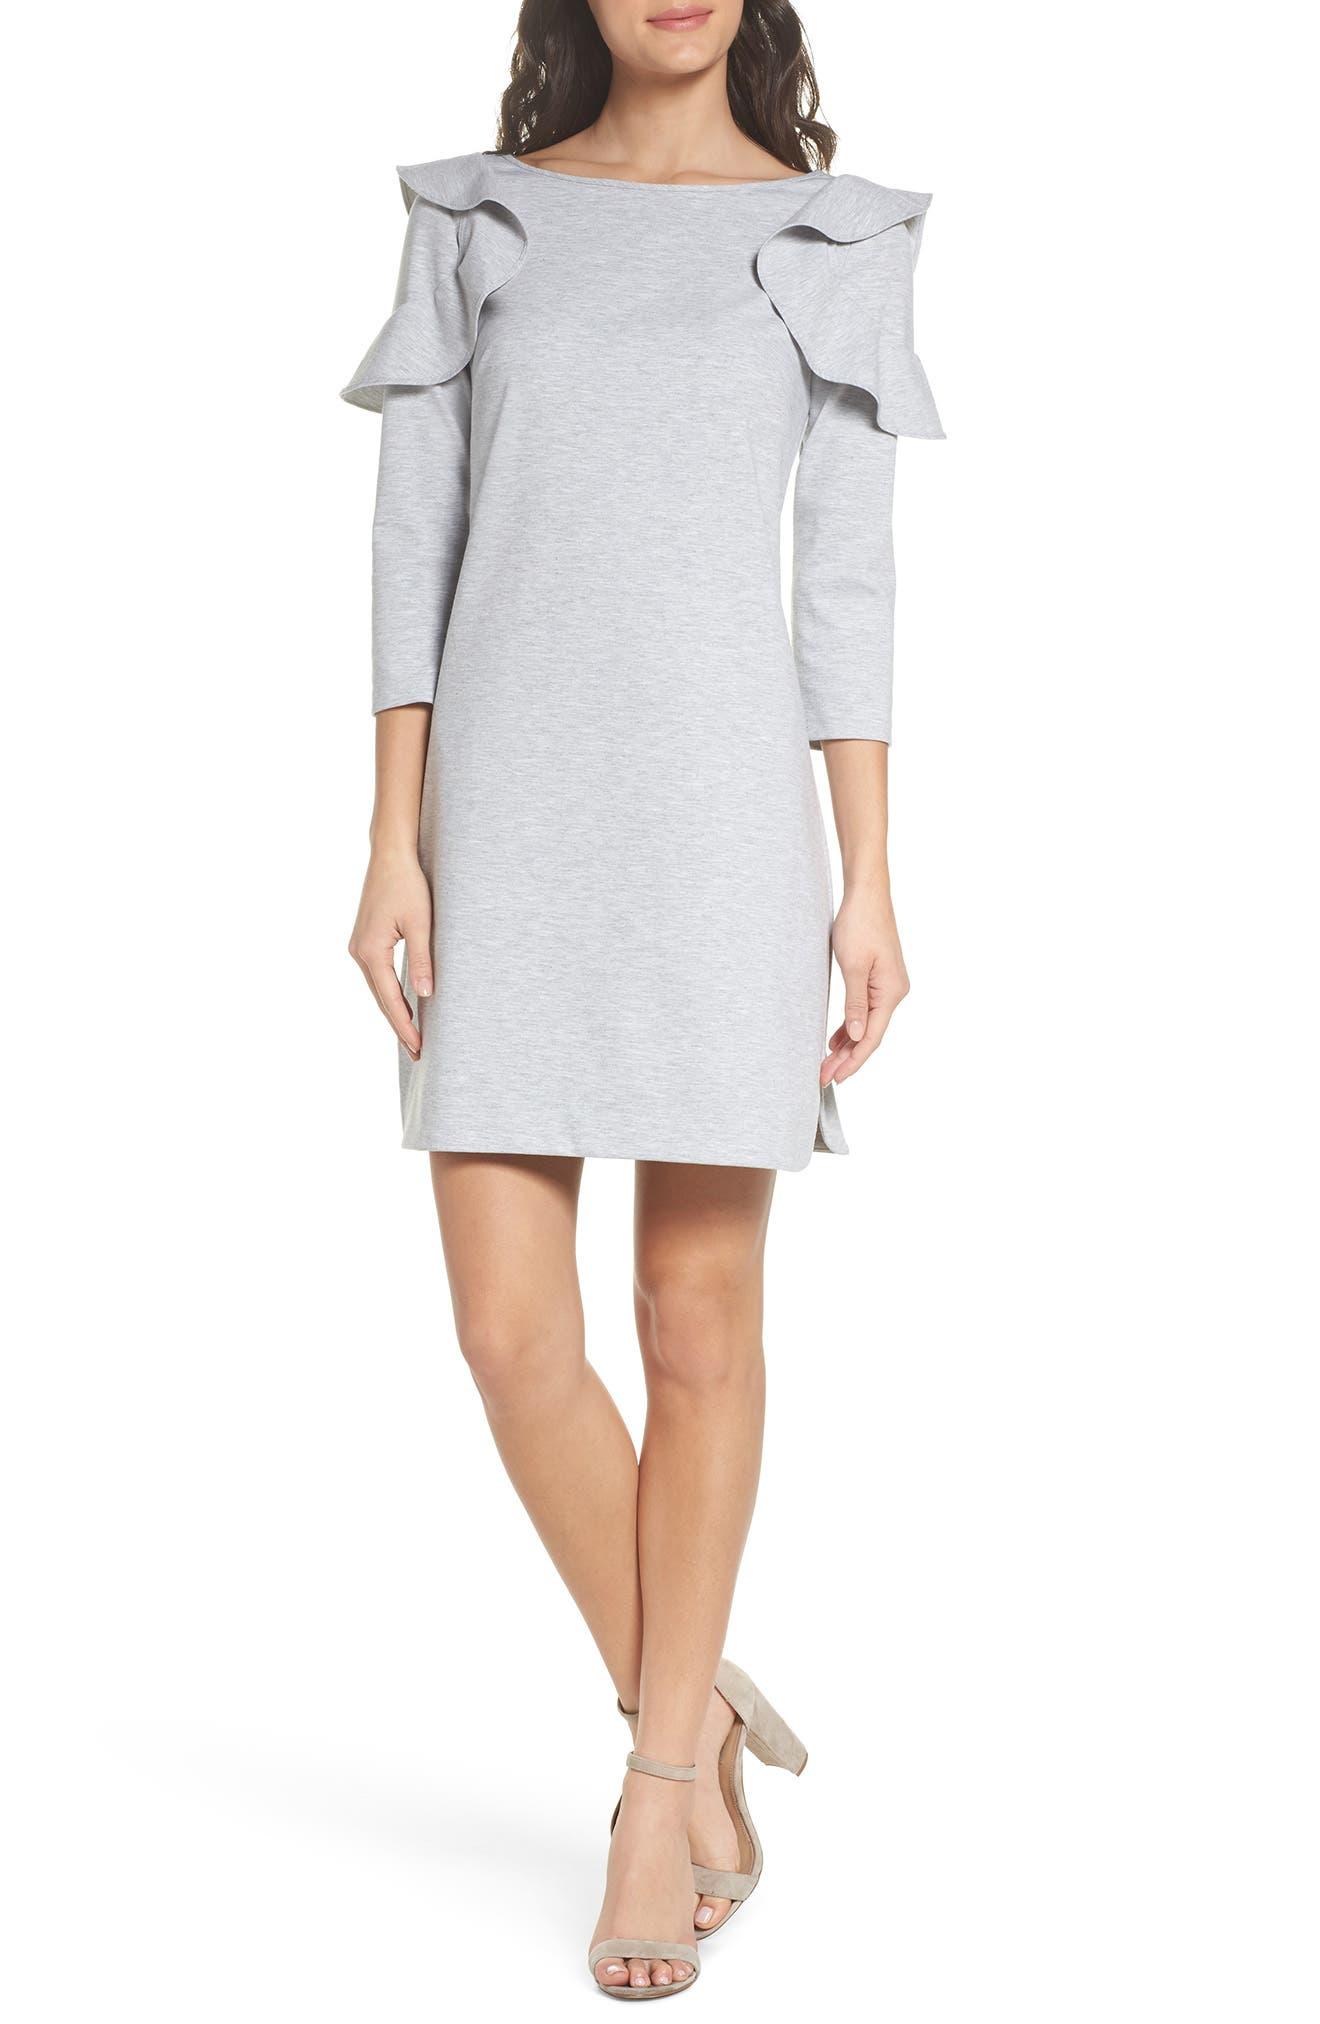 Ruffle Shoulder Sweatshirt Dress,                             Main thumbnail 1, color,                             Heather Grey